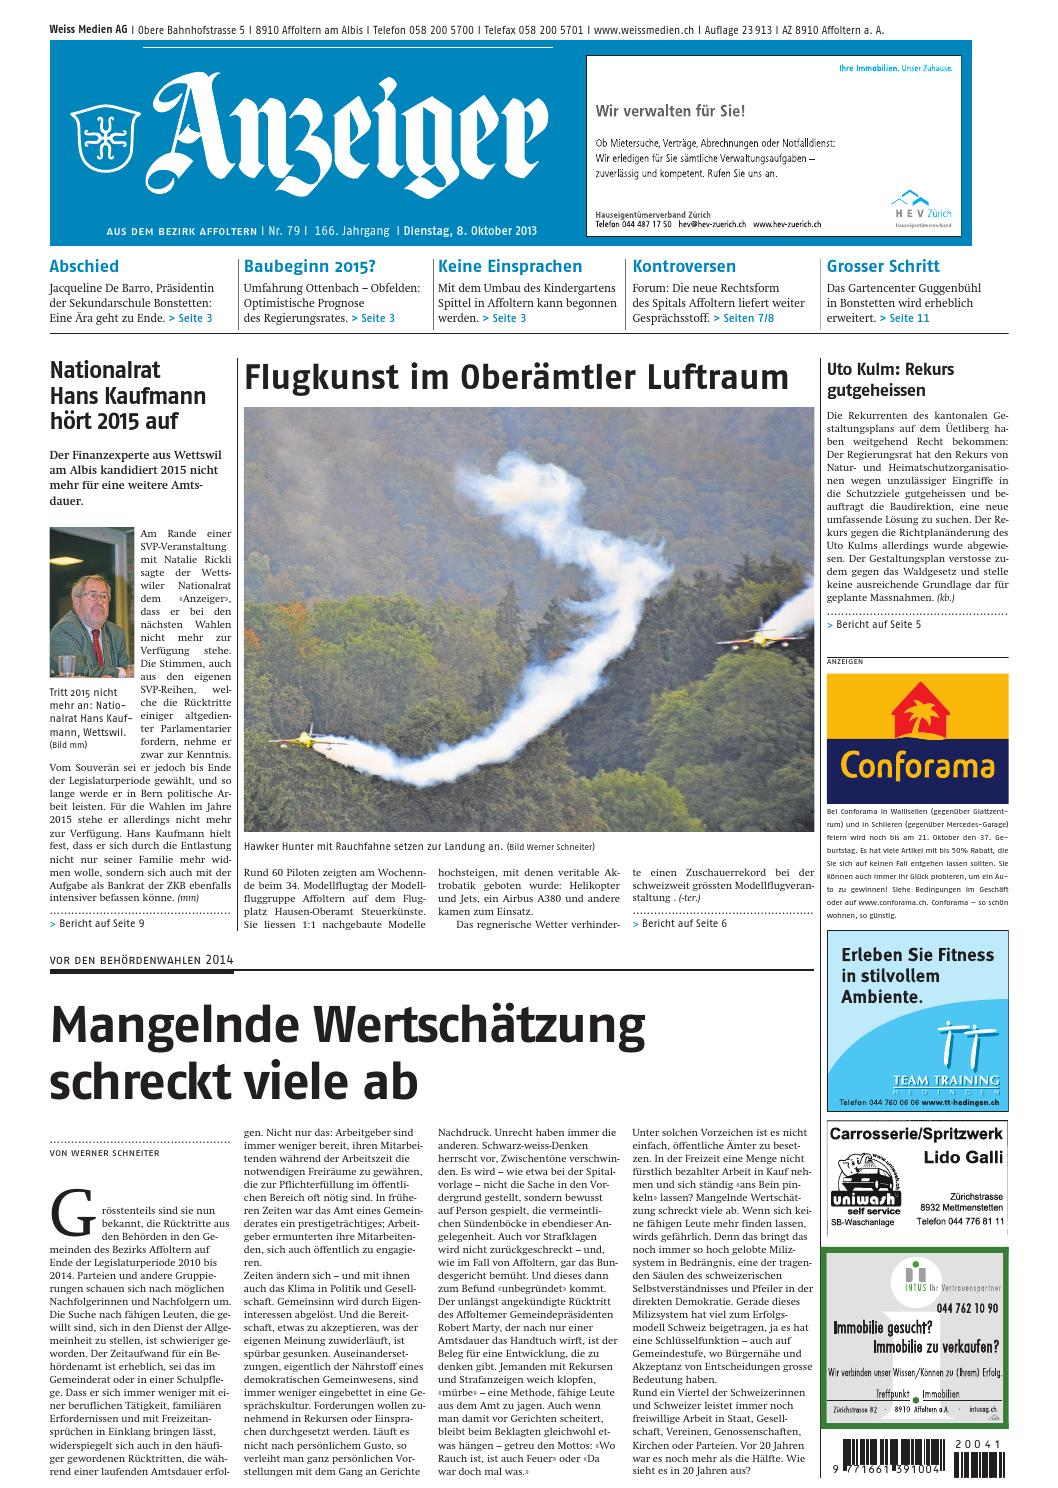 079 2013 by AZ-Anzeiger - issuu